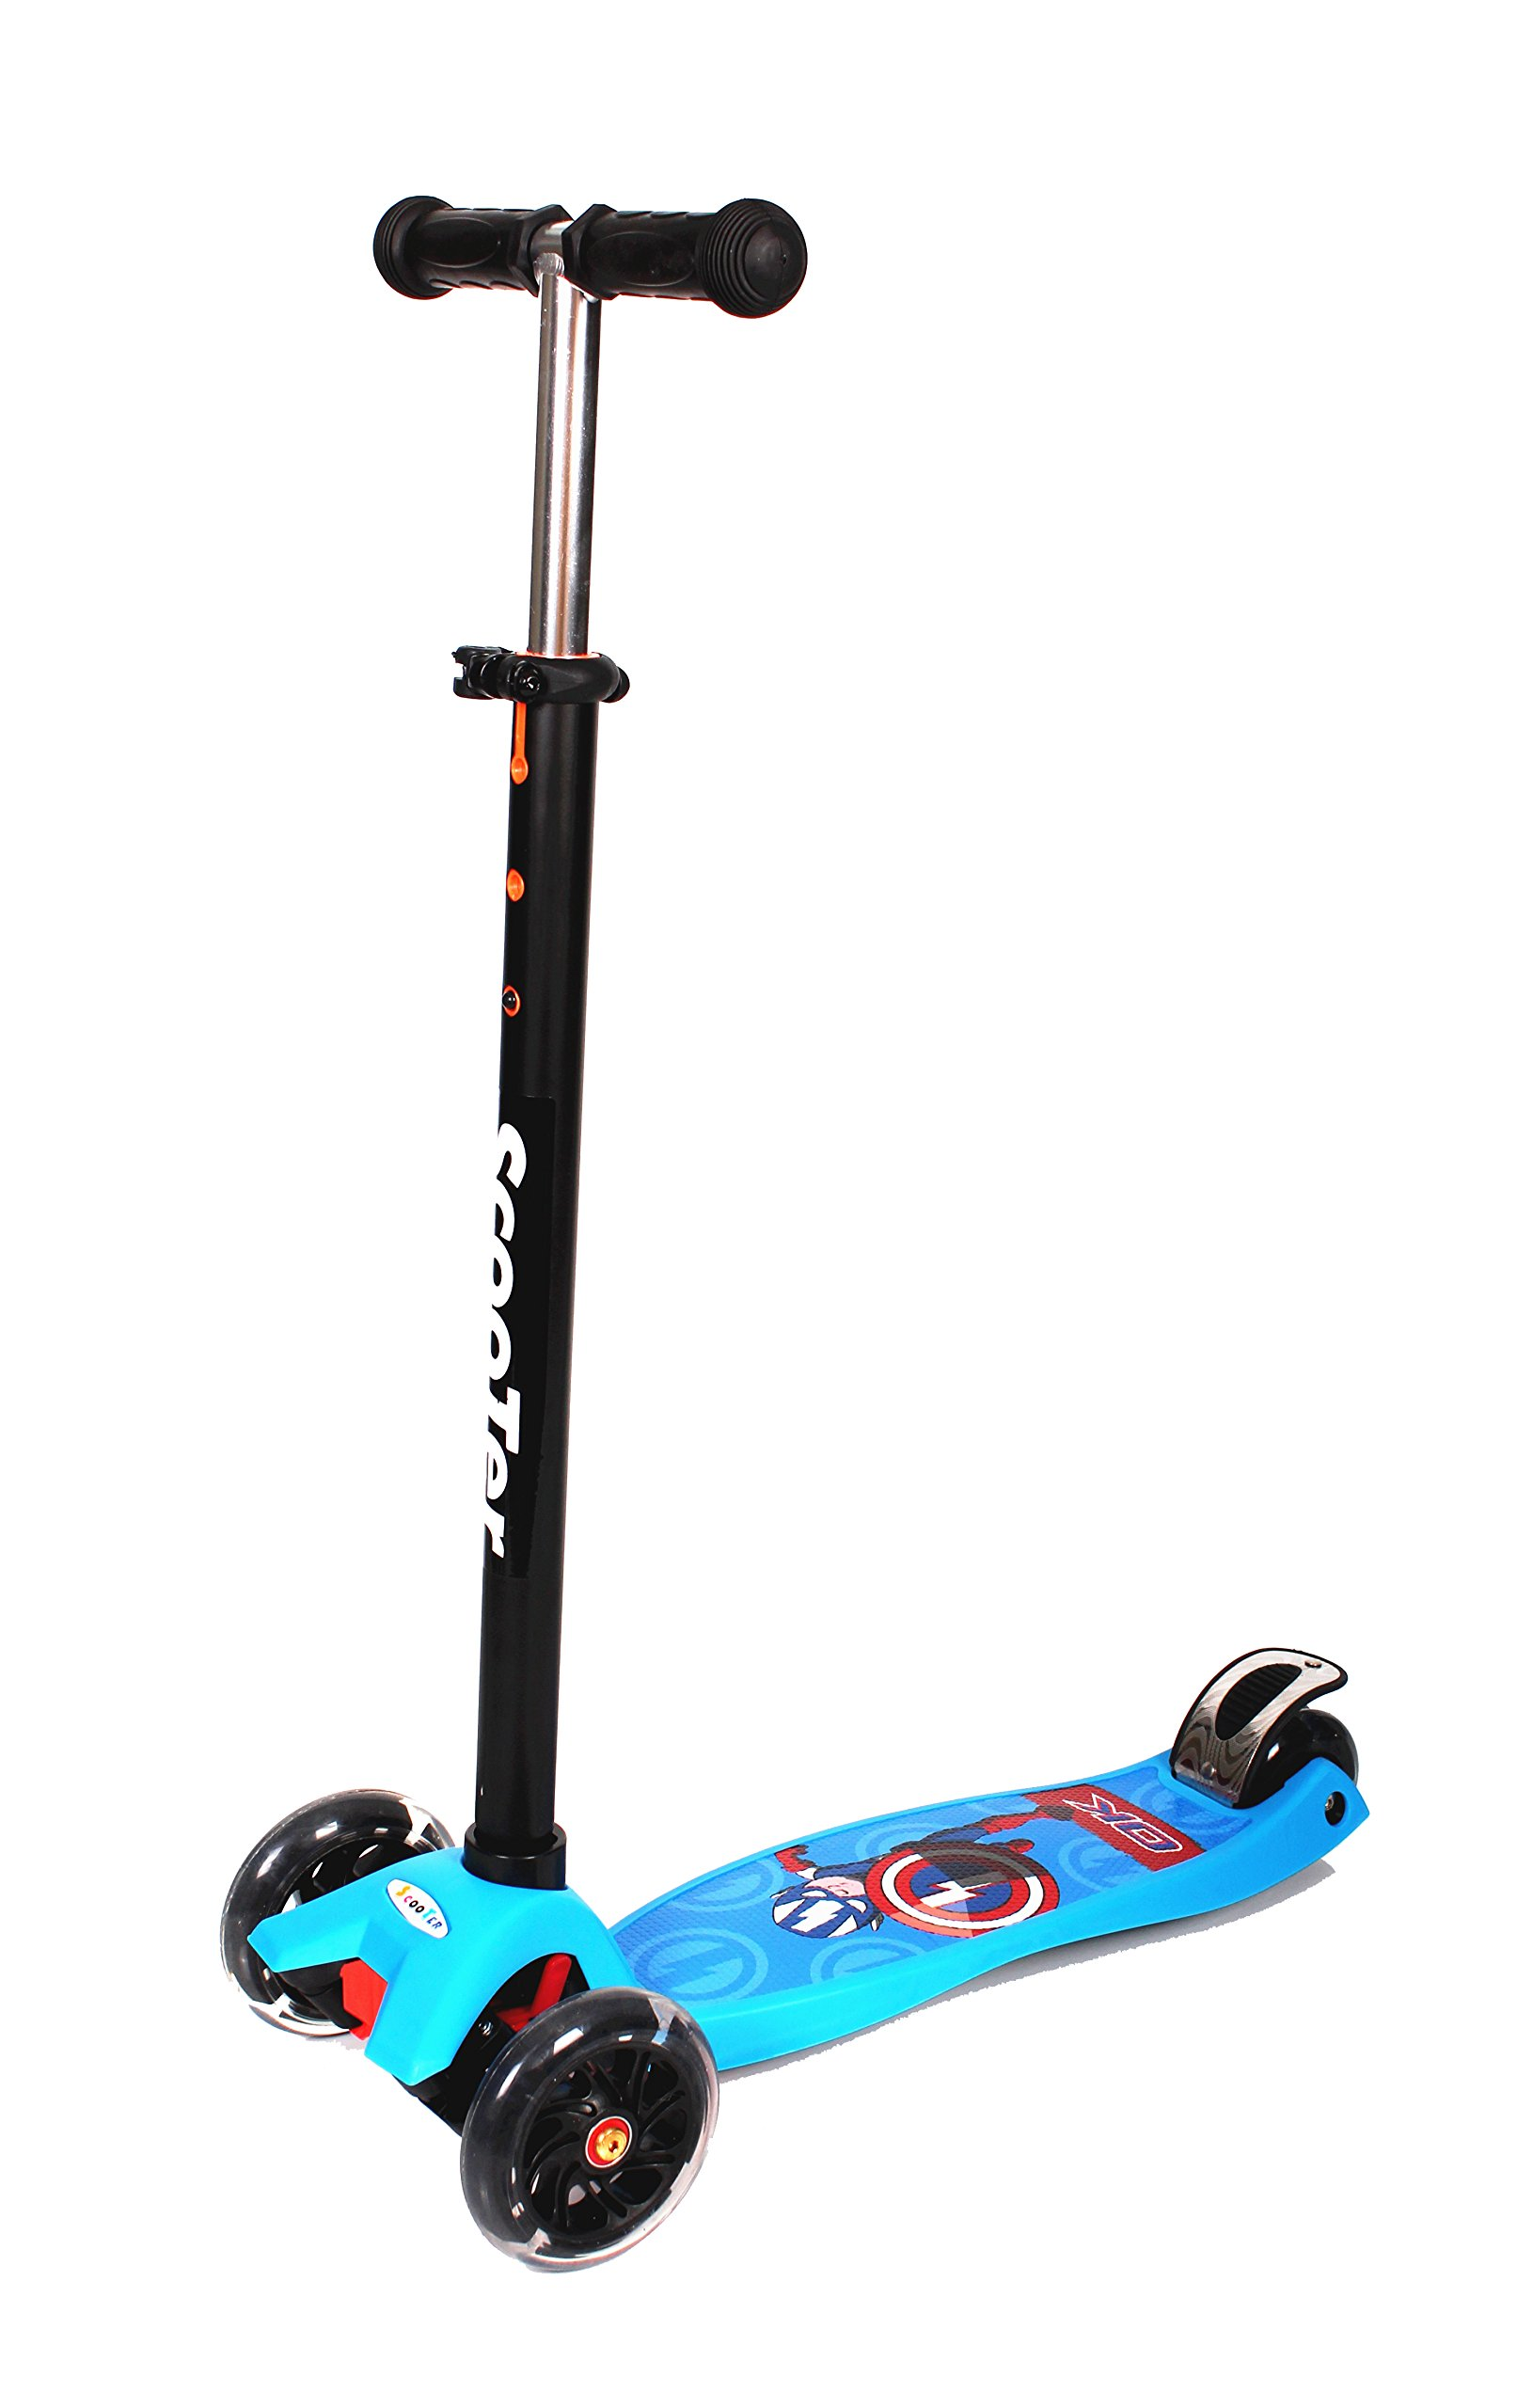 WiiSHAM Original Kick Scooter (blue) 3-10 years old